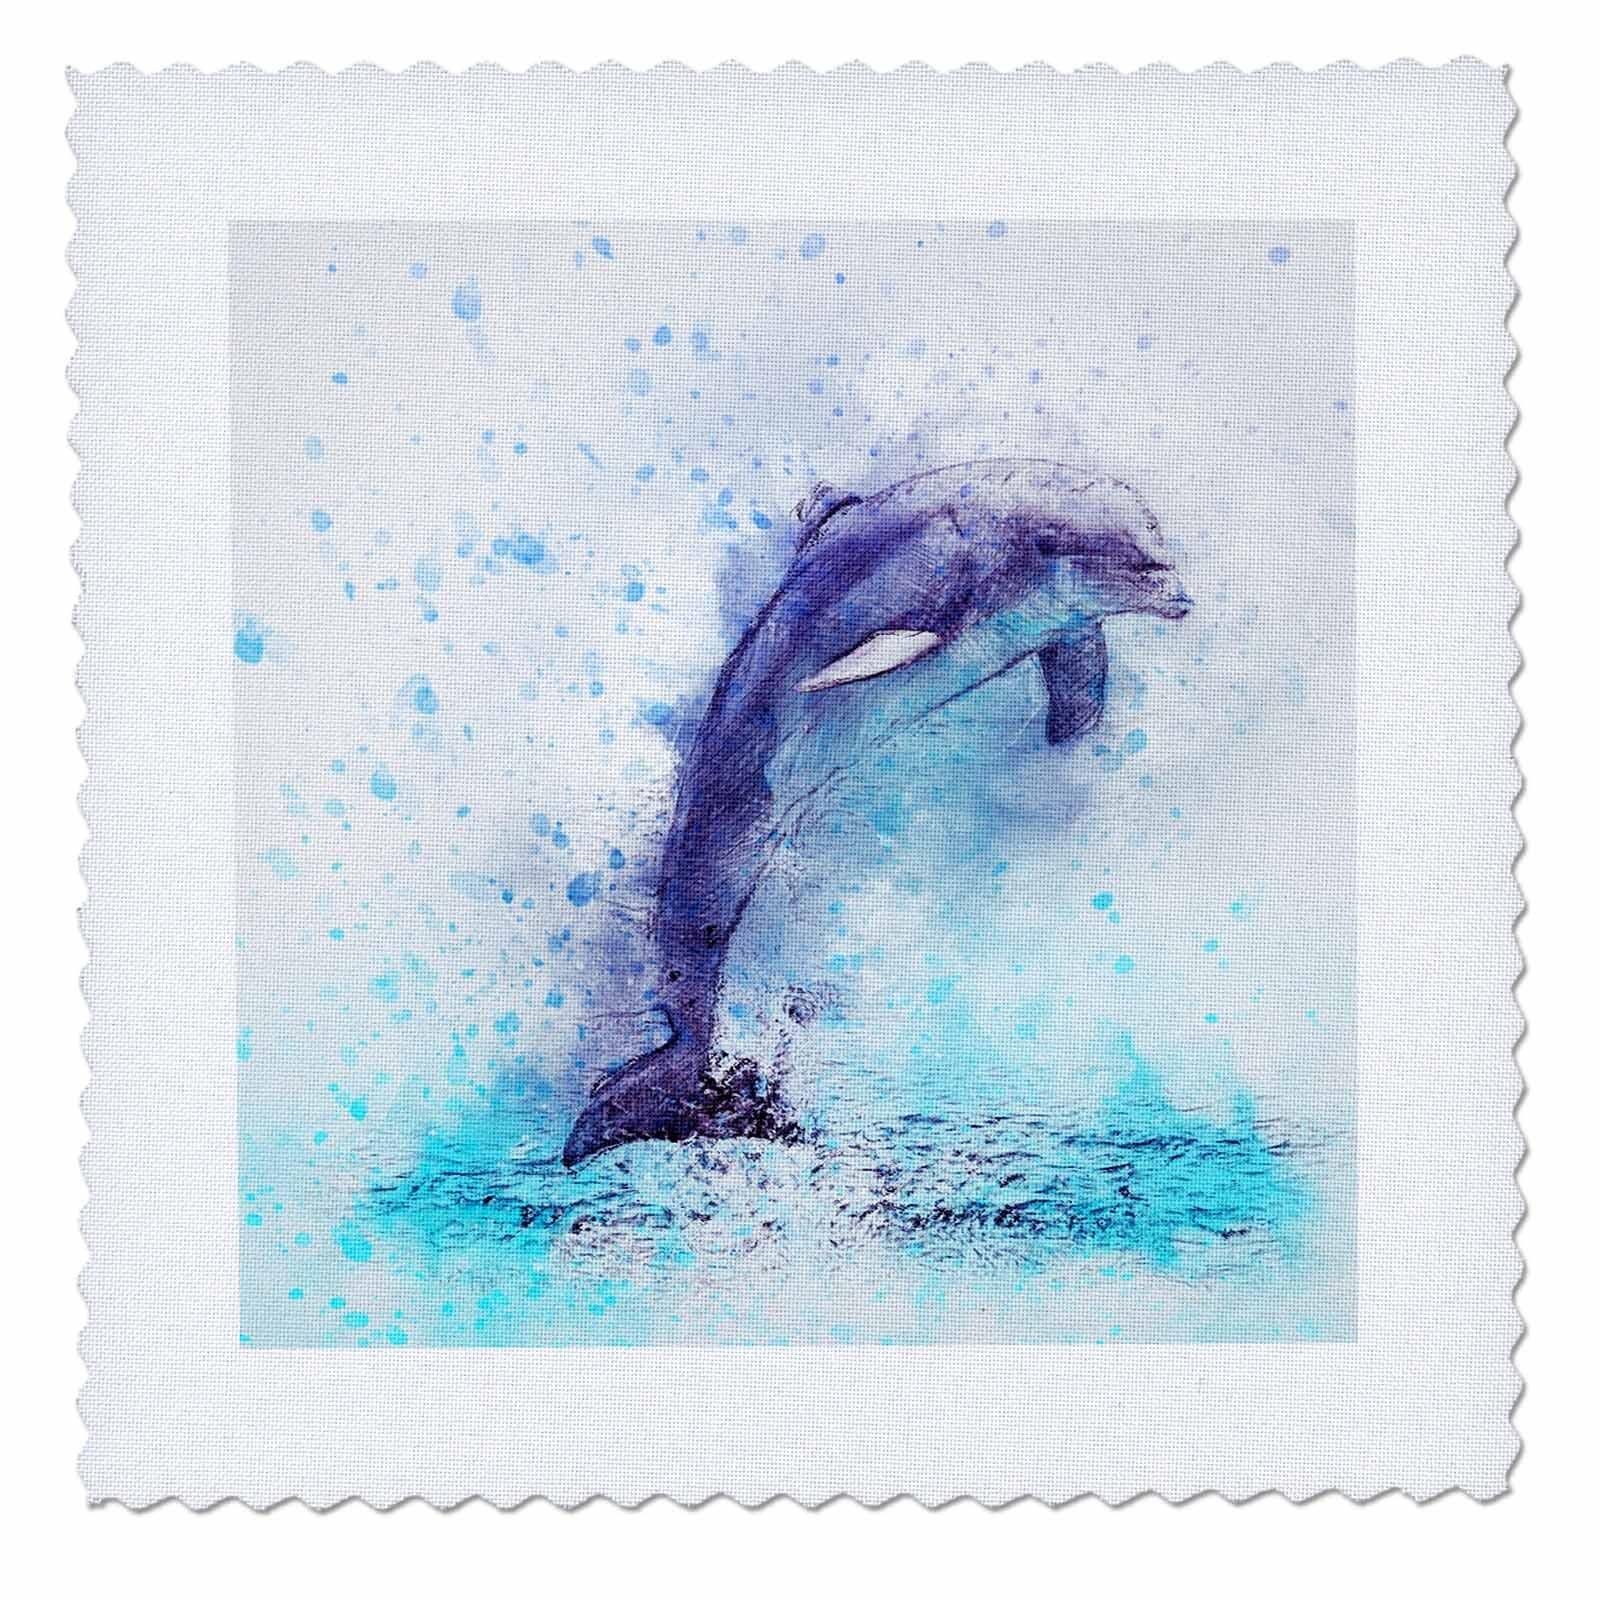 3dRose Sven Herkenrath Animal - Funny Watercolor Dolphin Sealife Ocean Fish Underwater - 25x25 inch quilt square (qs_280301_10)